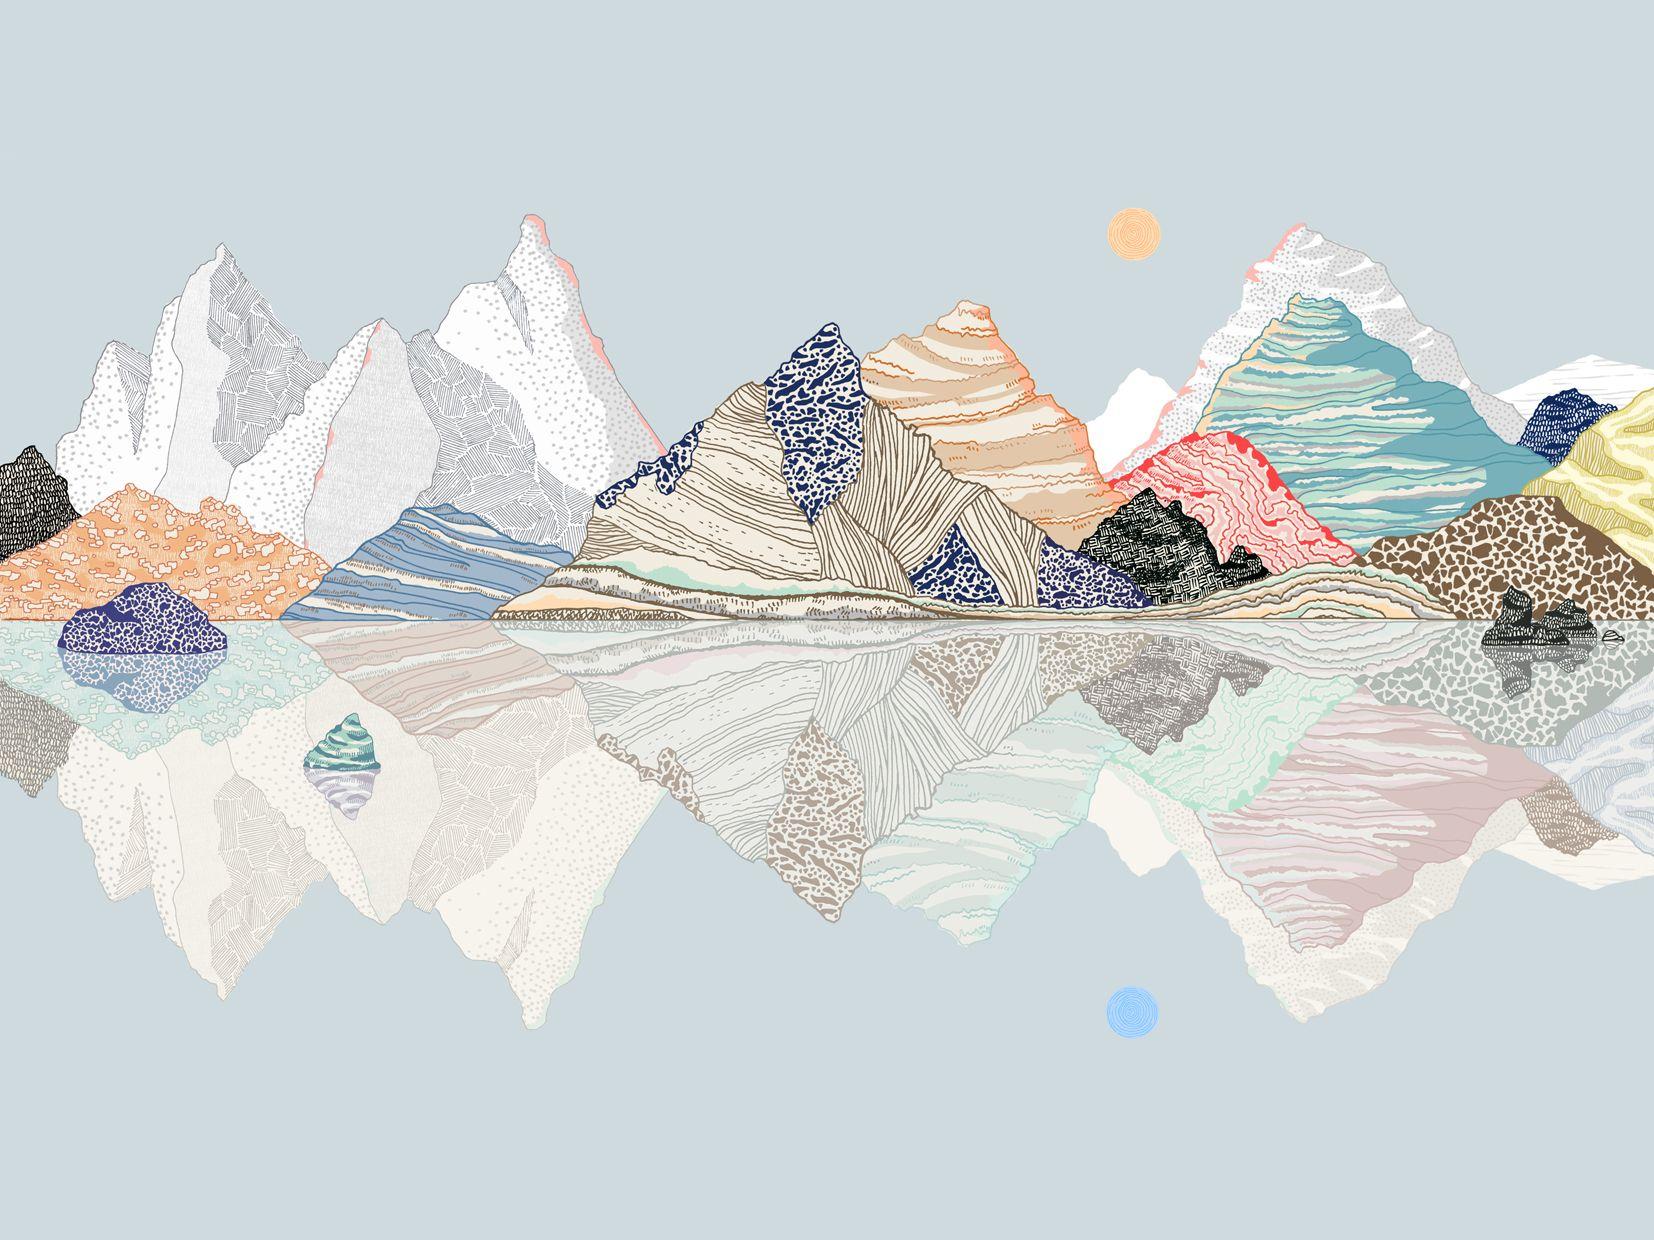 Blue Mountains Reflection Limited Edition Print Ana De Lima Desktop Wallpaper Art Aesthetic Desktop Wallpaper Art